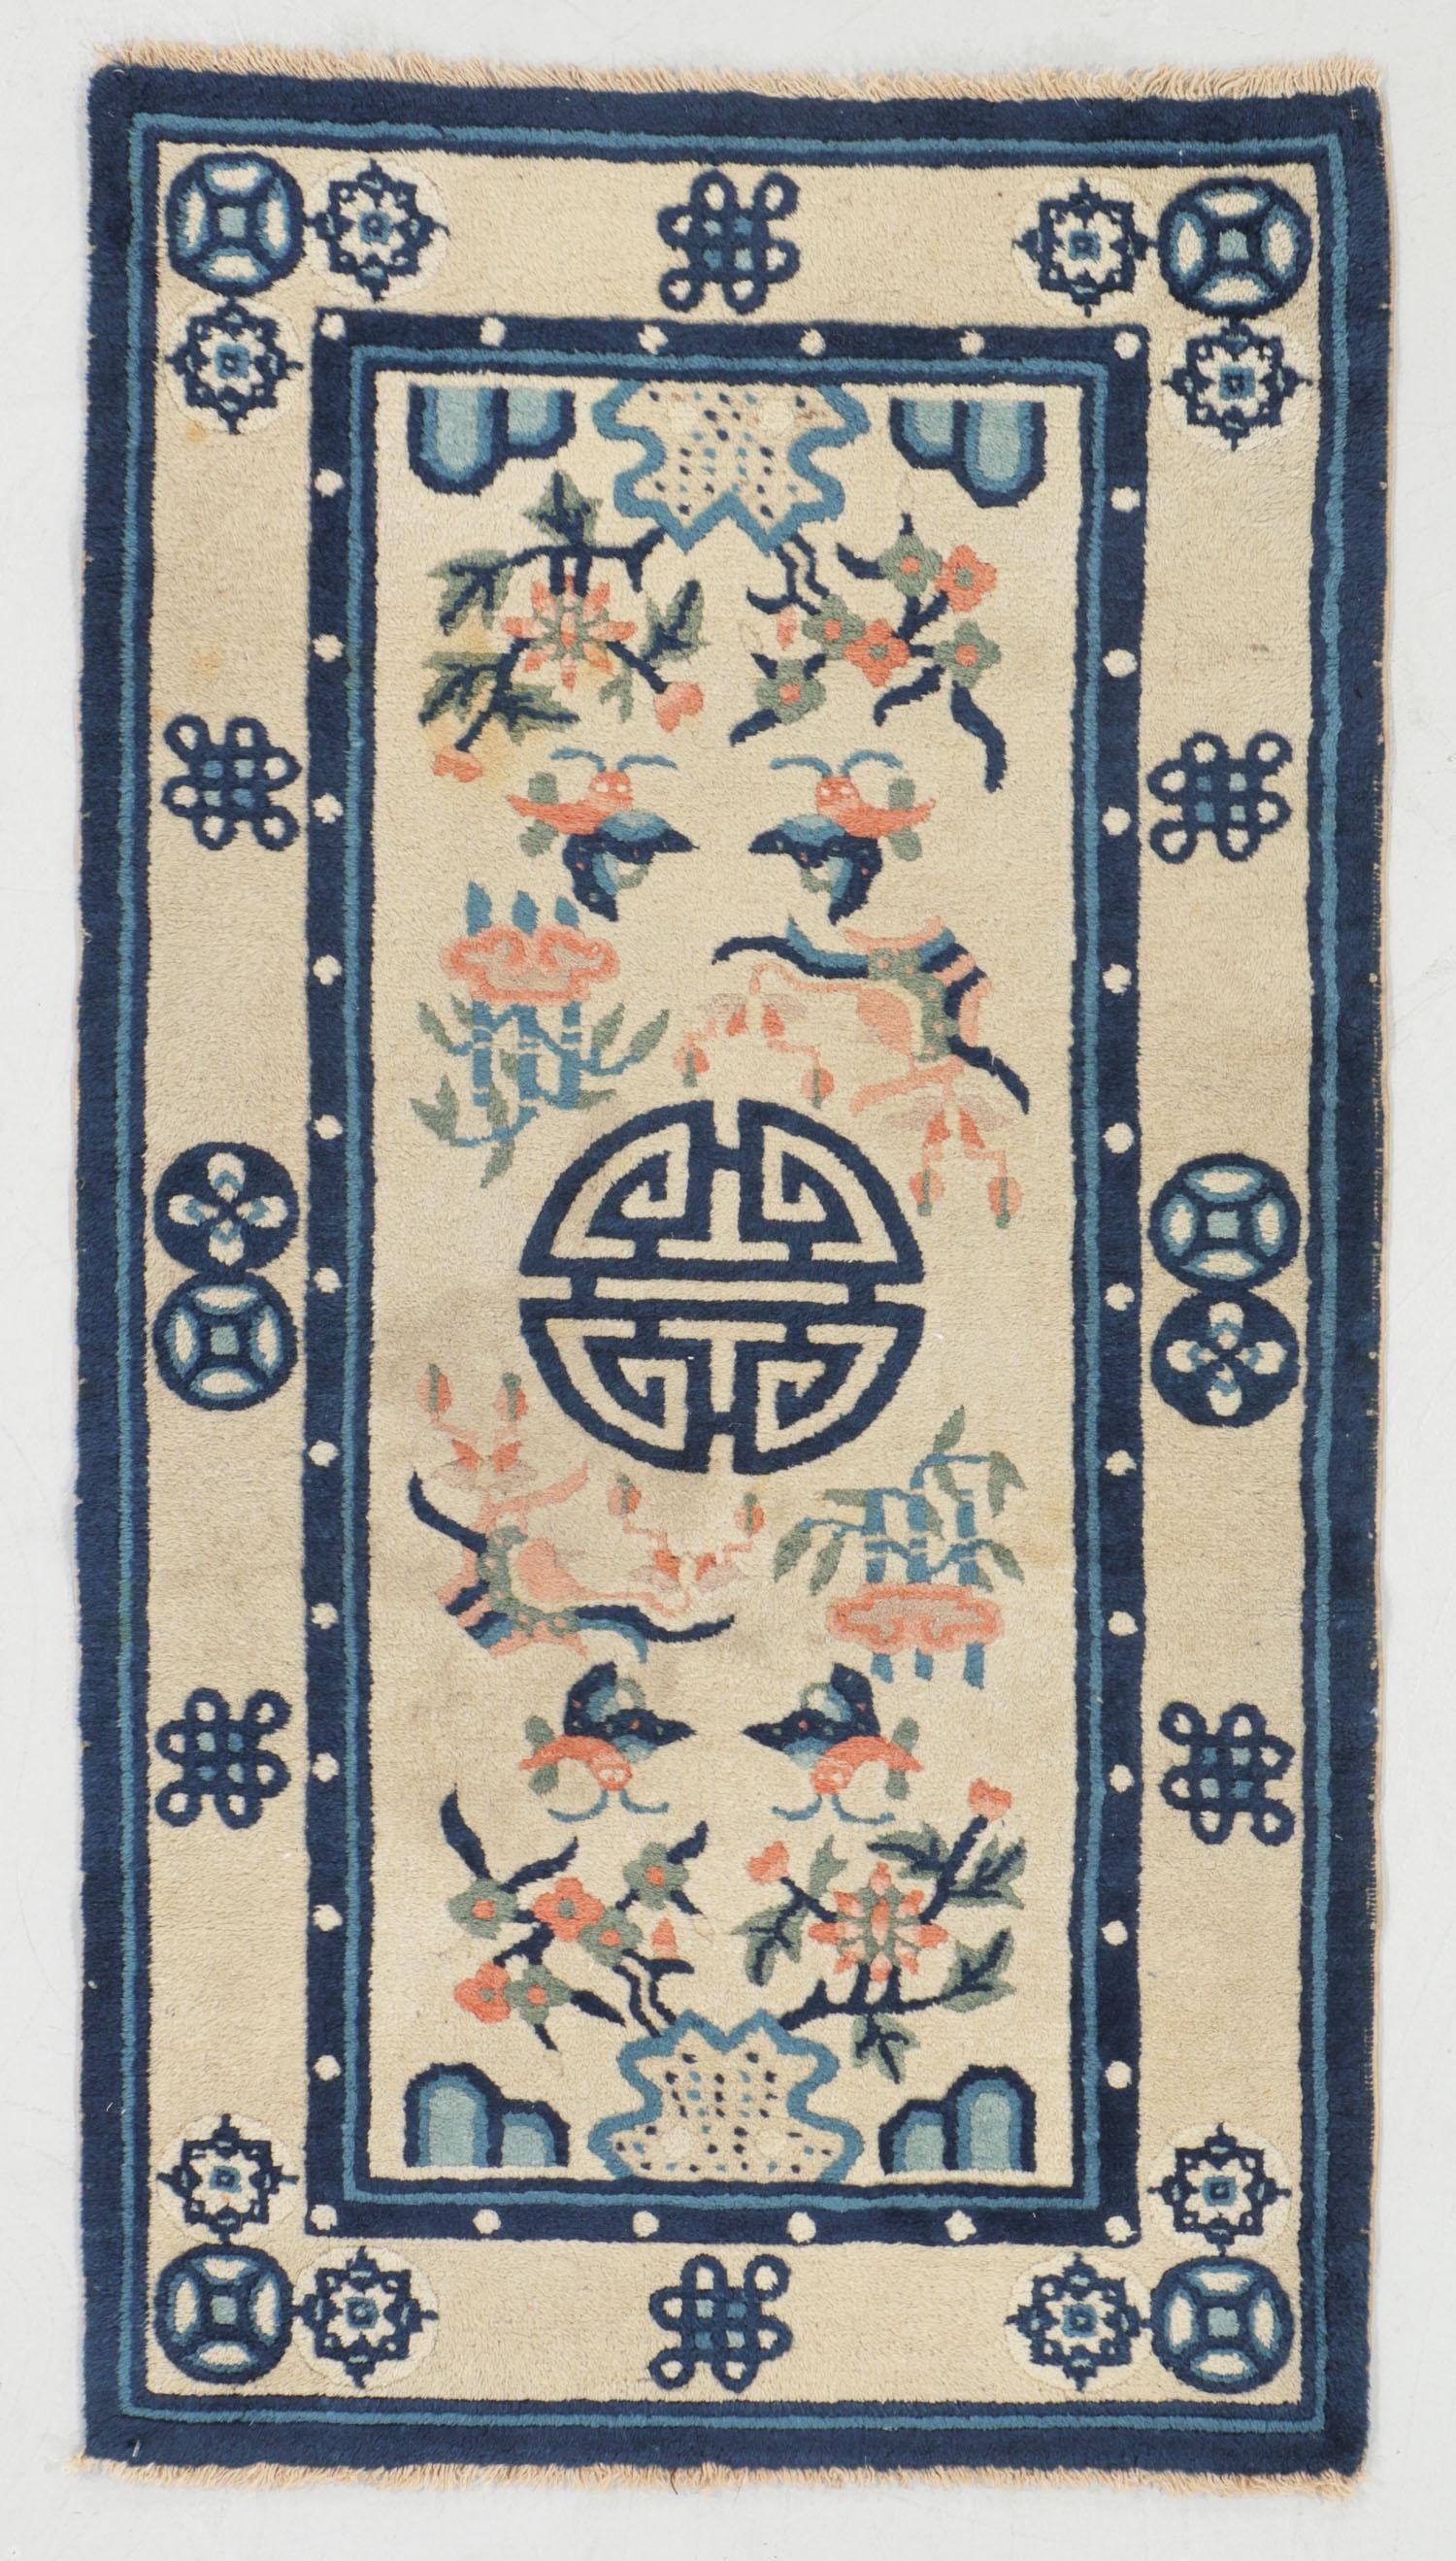 Semi-Antique Peking Rug, China: 2'2'' x 3'11''